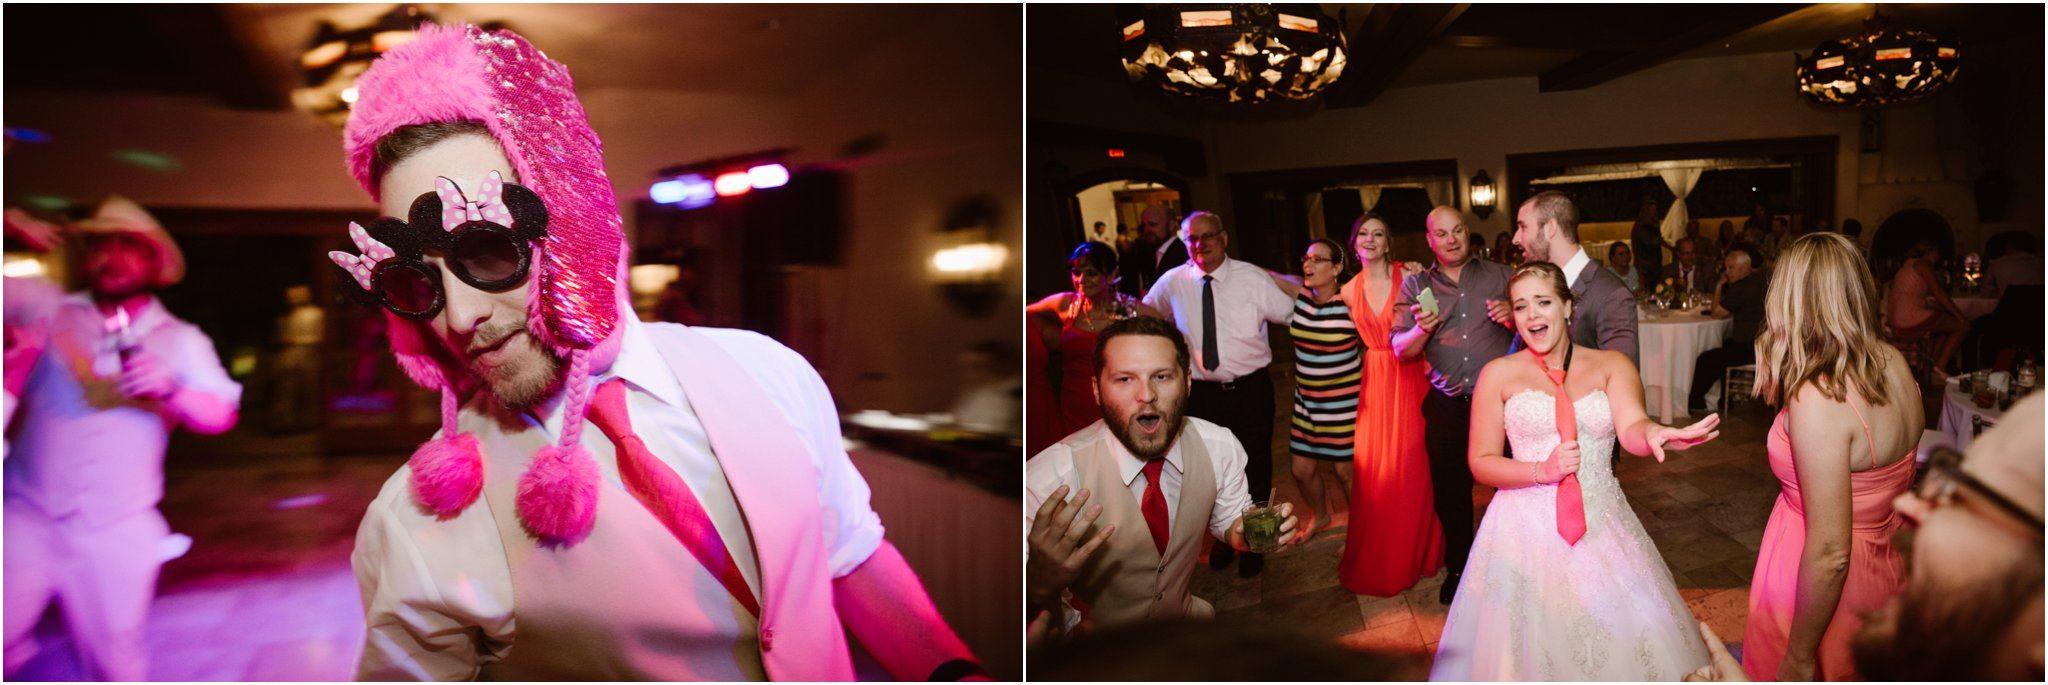 0093albuquerque-wedding-photographer_-santa-fe-wedding-photographer_-southwest-wedding-photography_-blue-rose-studio